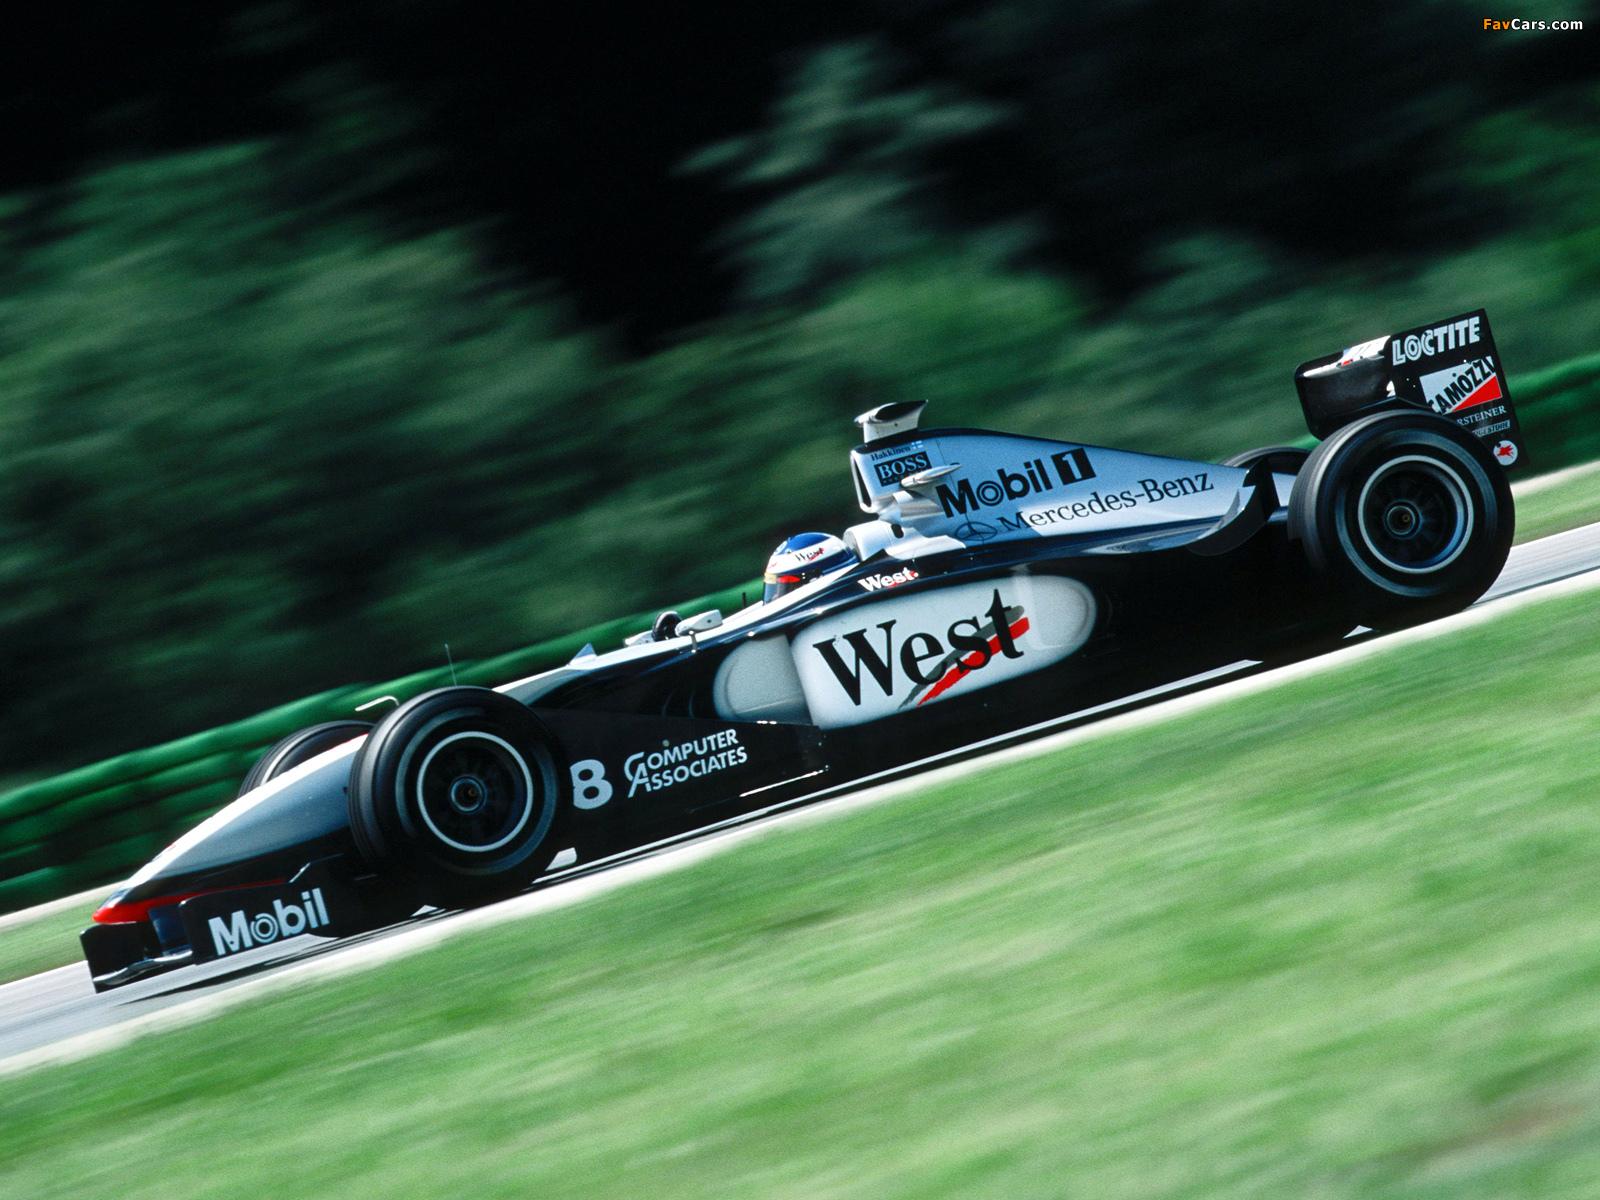 Images of mclaren mercedes benz mp4 13 1998 1600x1200 for Mercedes benz formula 1